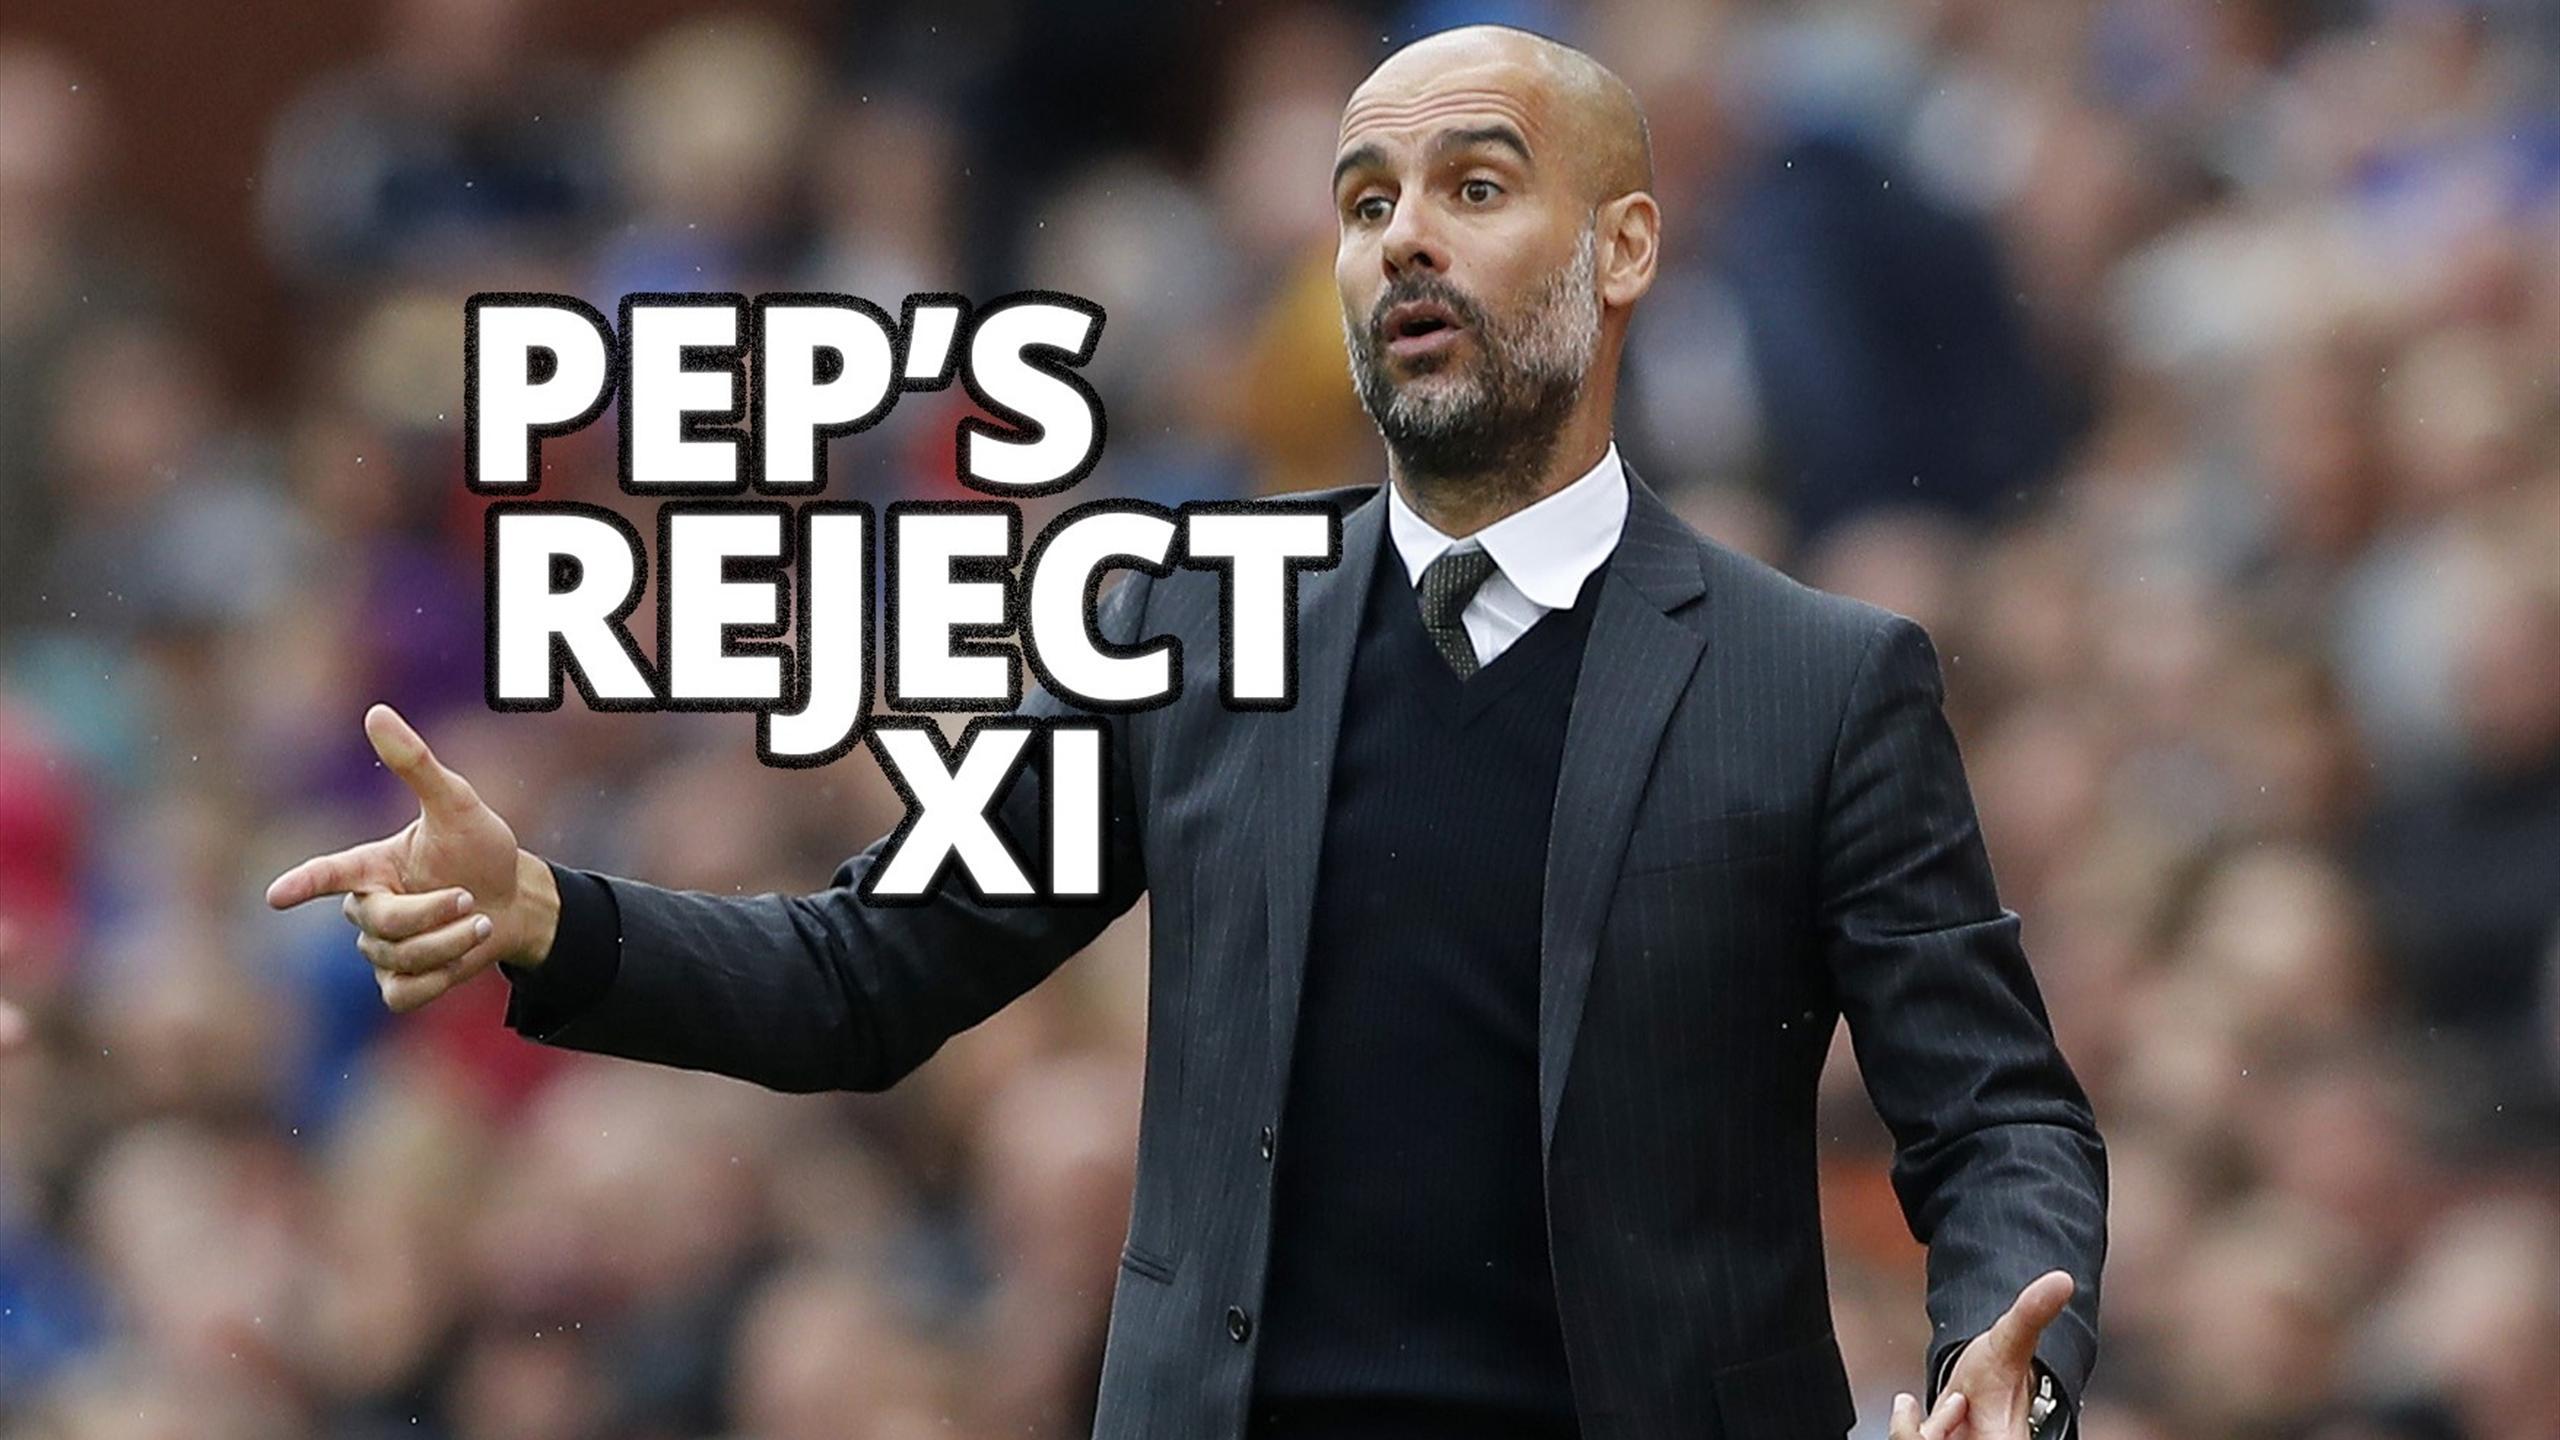 Pep Guardiola Rejects XI